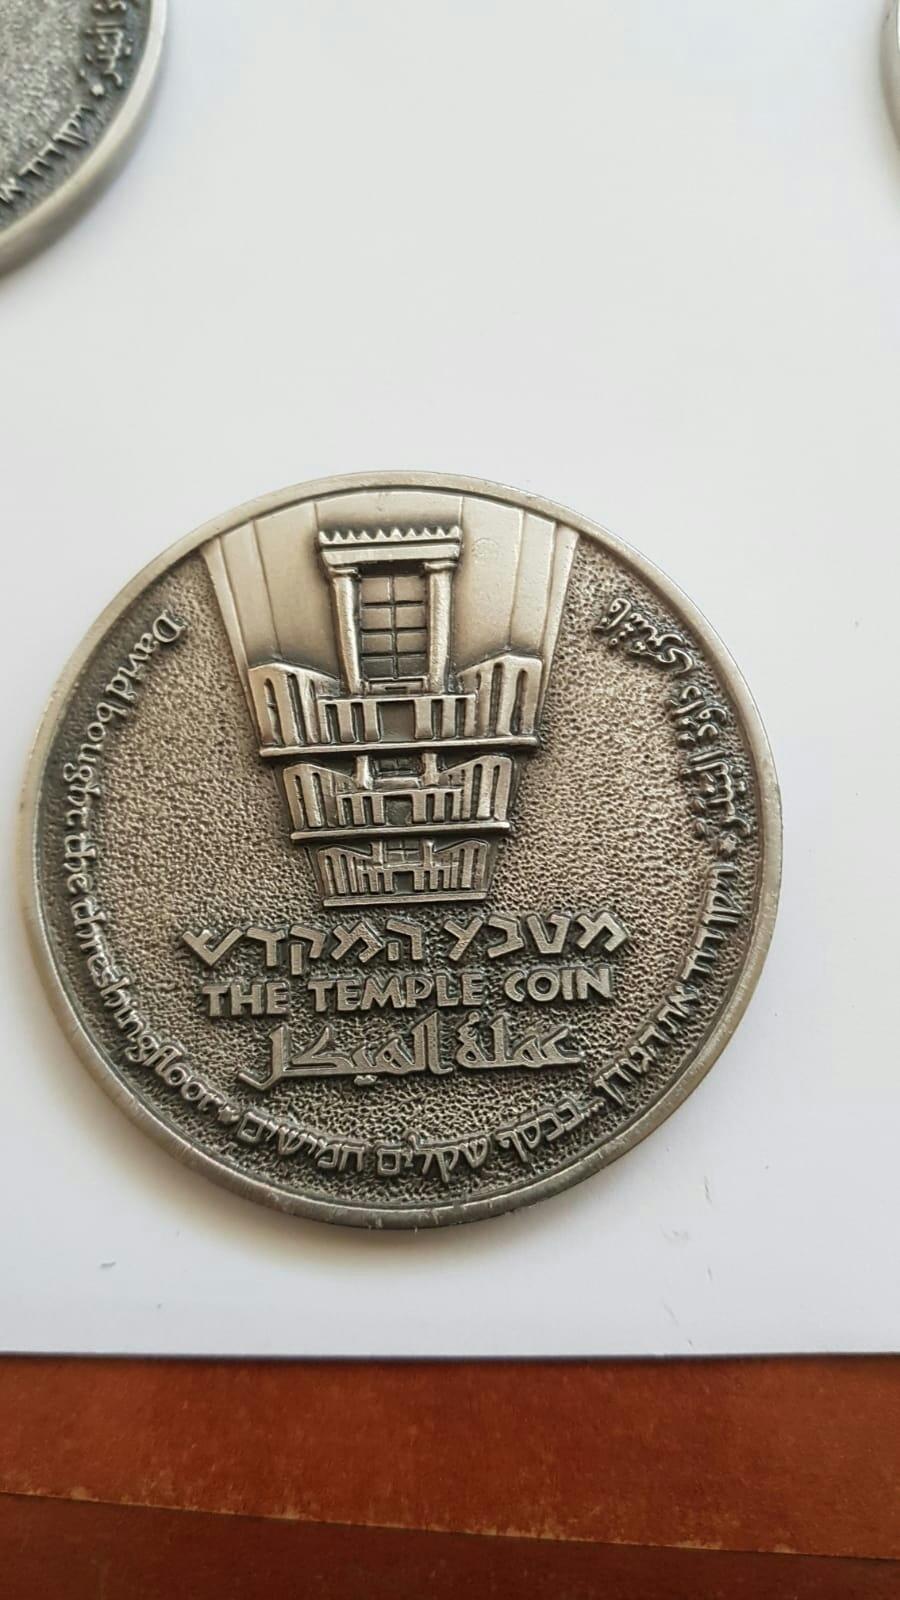 HALF SHEKEL KING DAVID COIN - silver plated